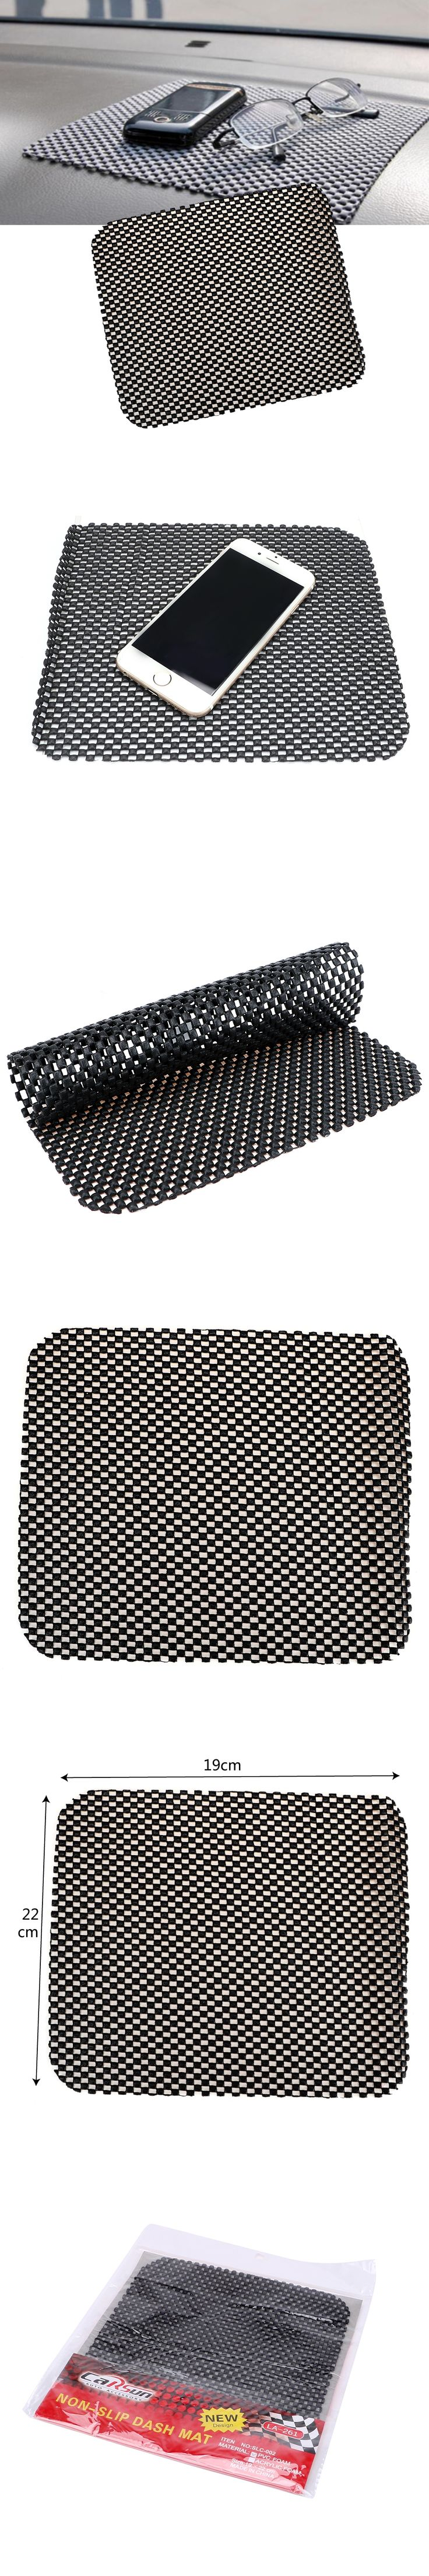 Anti Slip Mat For MP3 MP4 PDA 19cm*21cm Car Dashboard Holder For Mobile Phone Auto Accessories Black PVC Non Slip Sticky Pad